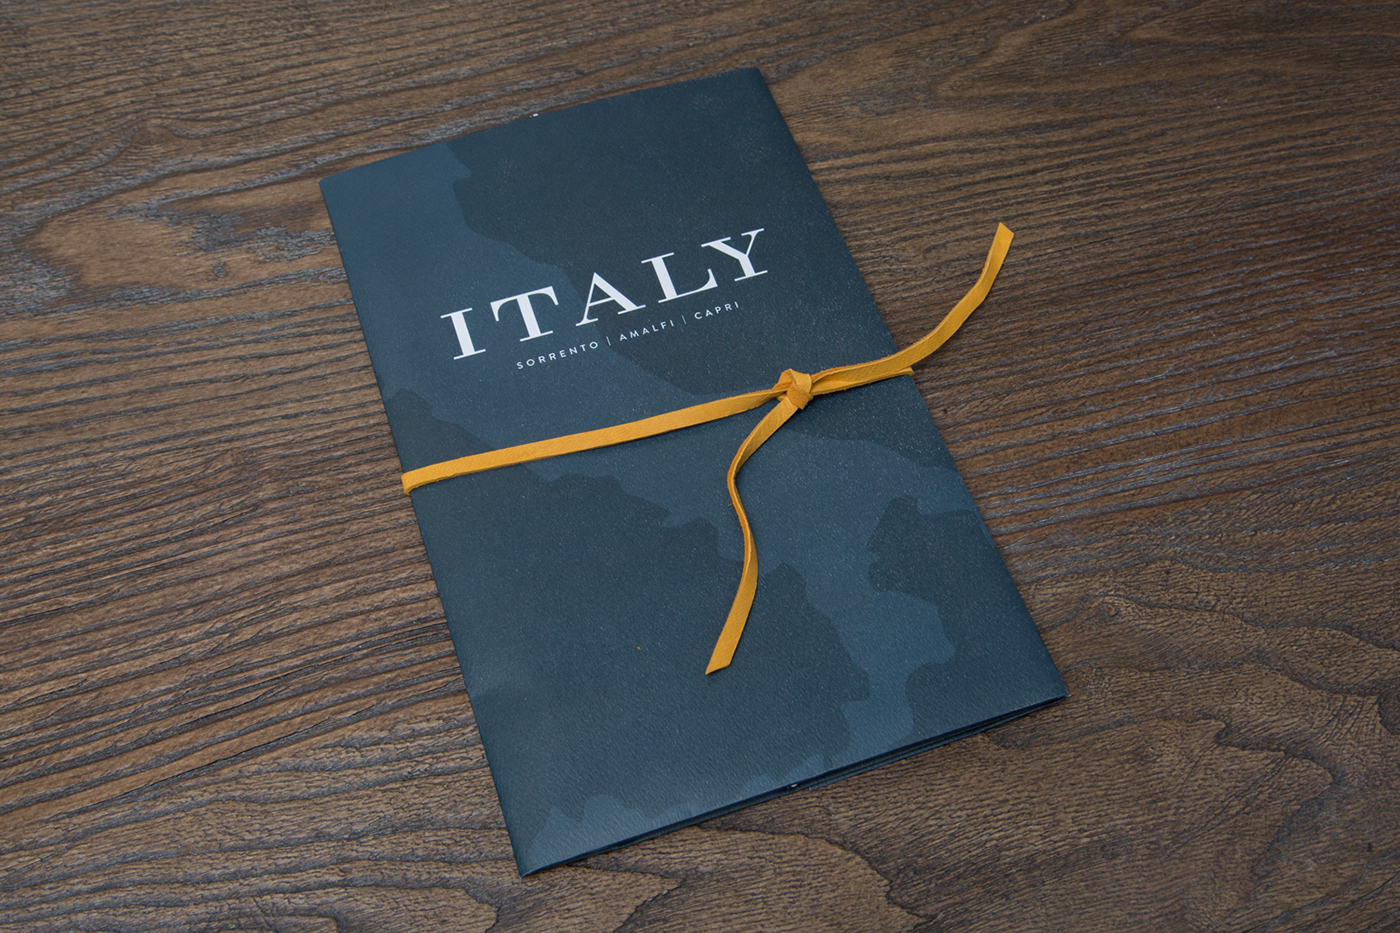 Italy Travel trip rewards Impact Partnership